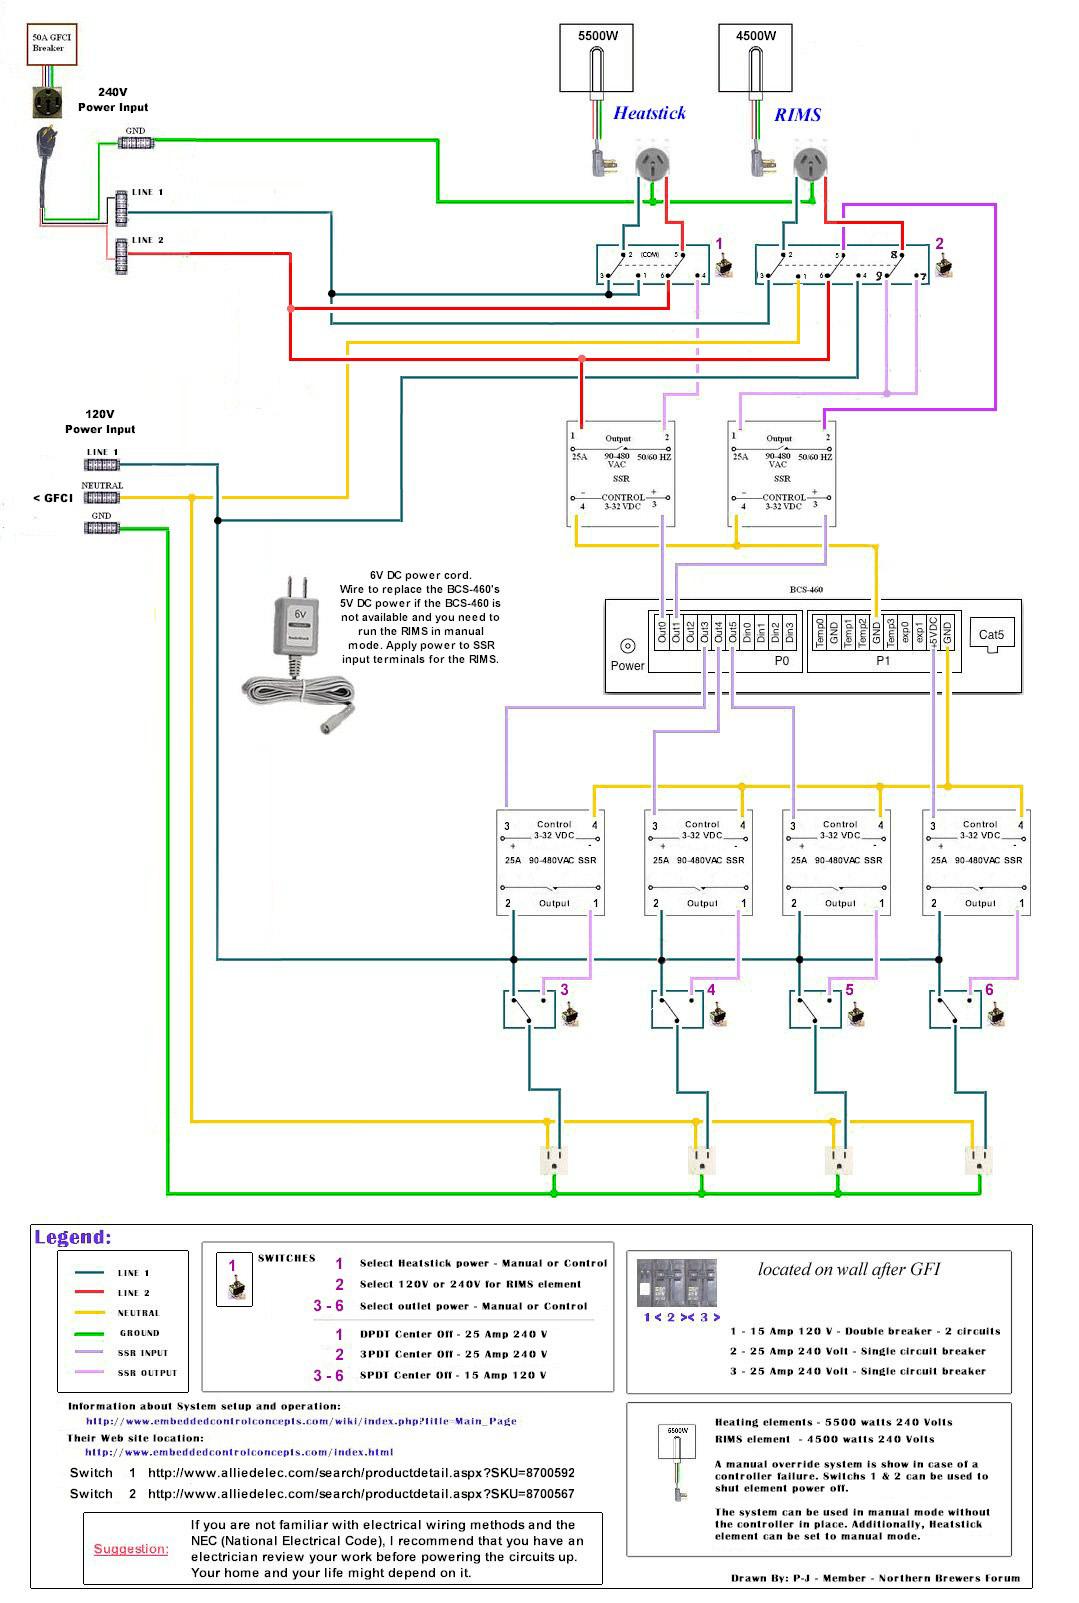 wiring diagram rims bcs bcs wiring diagram